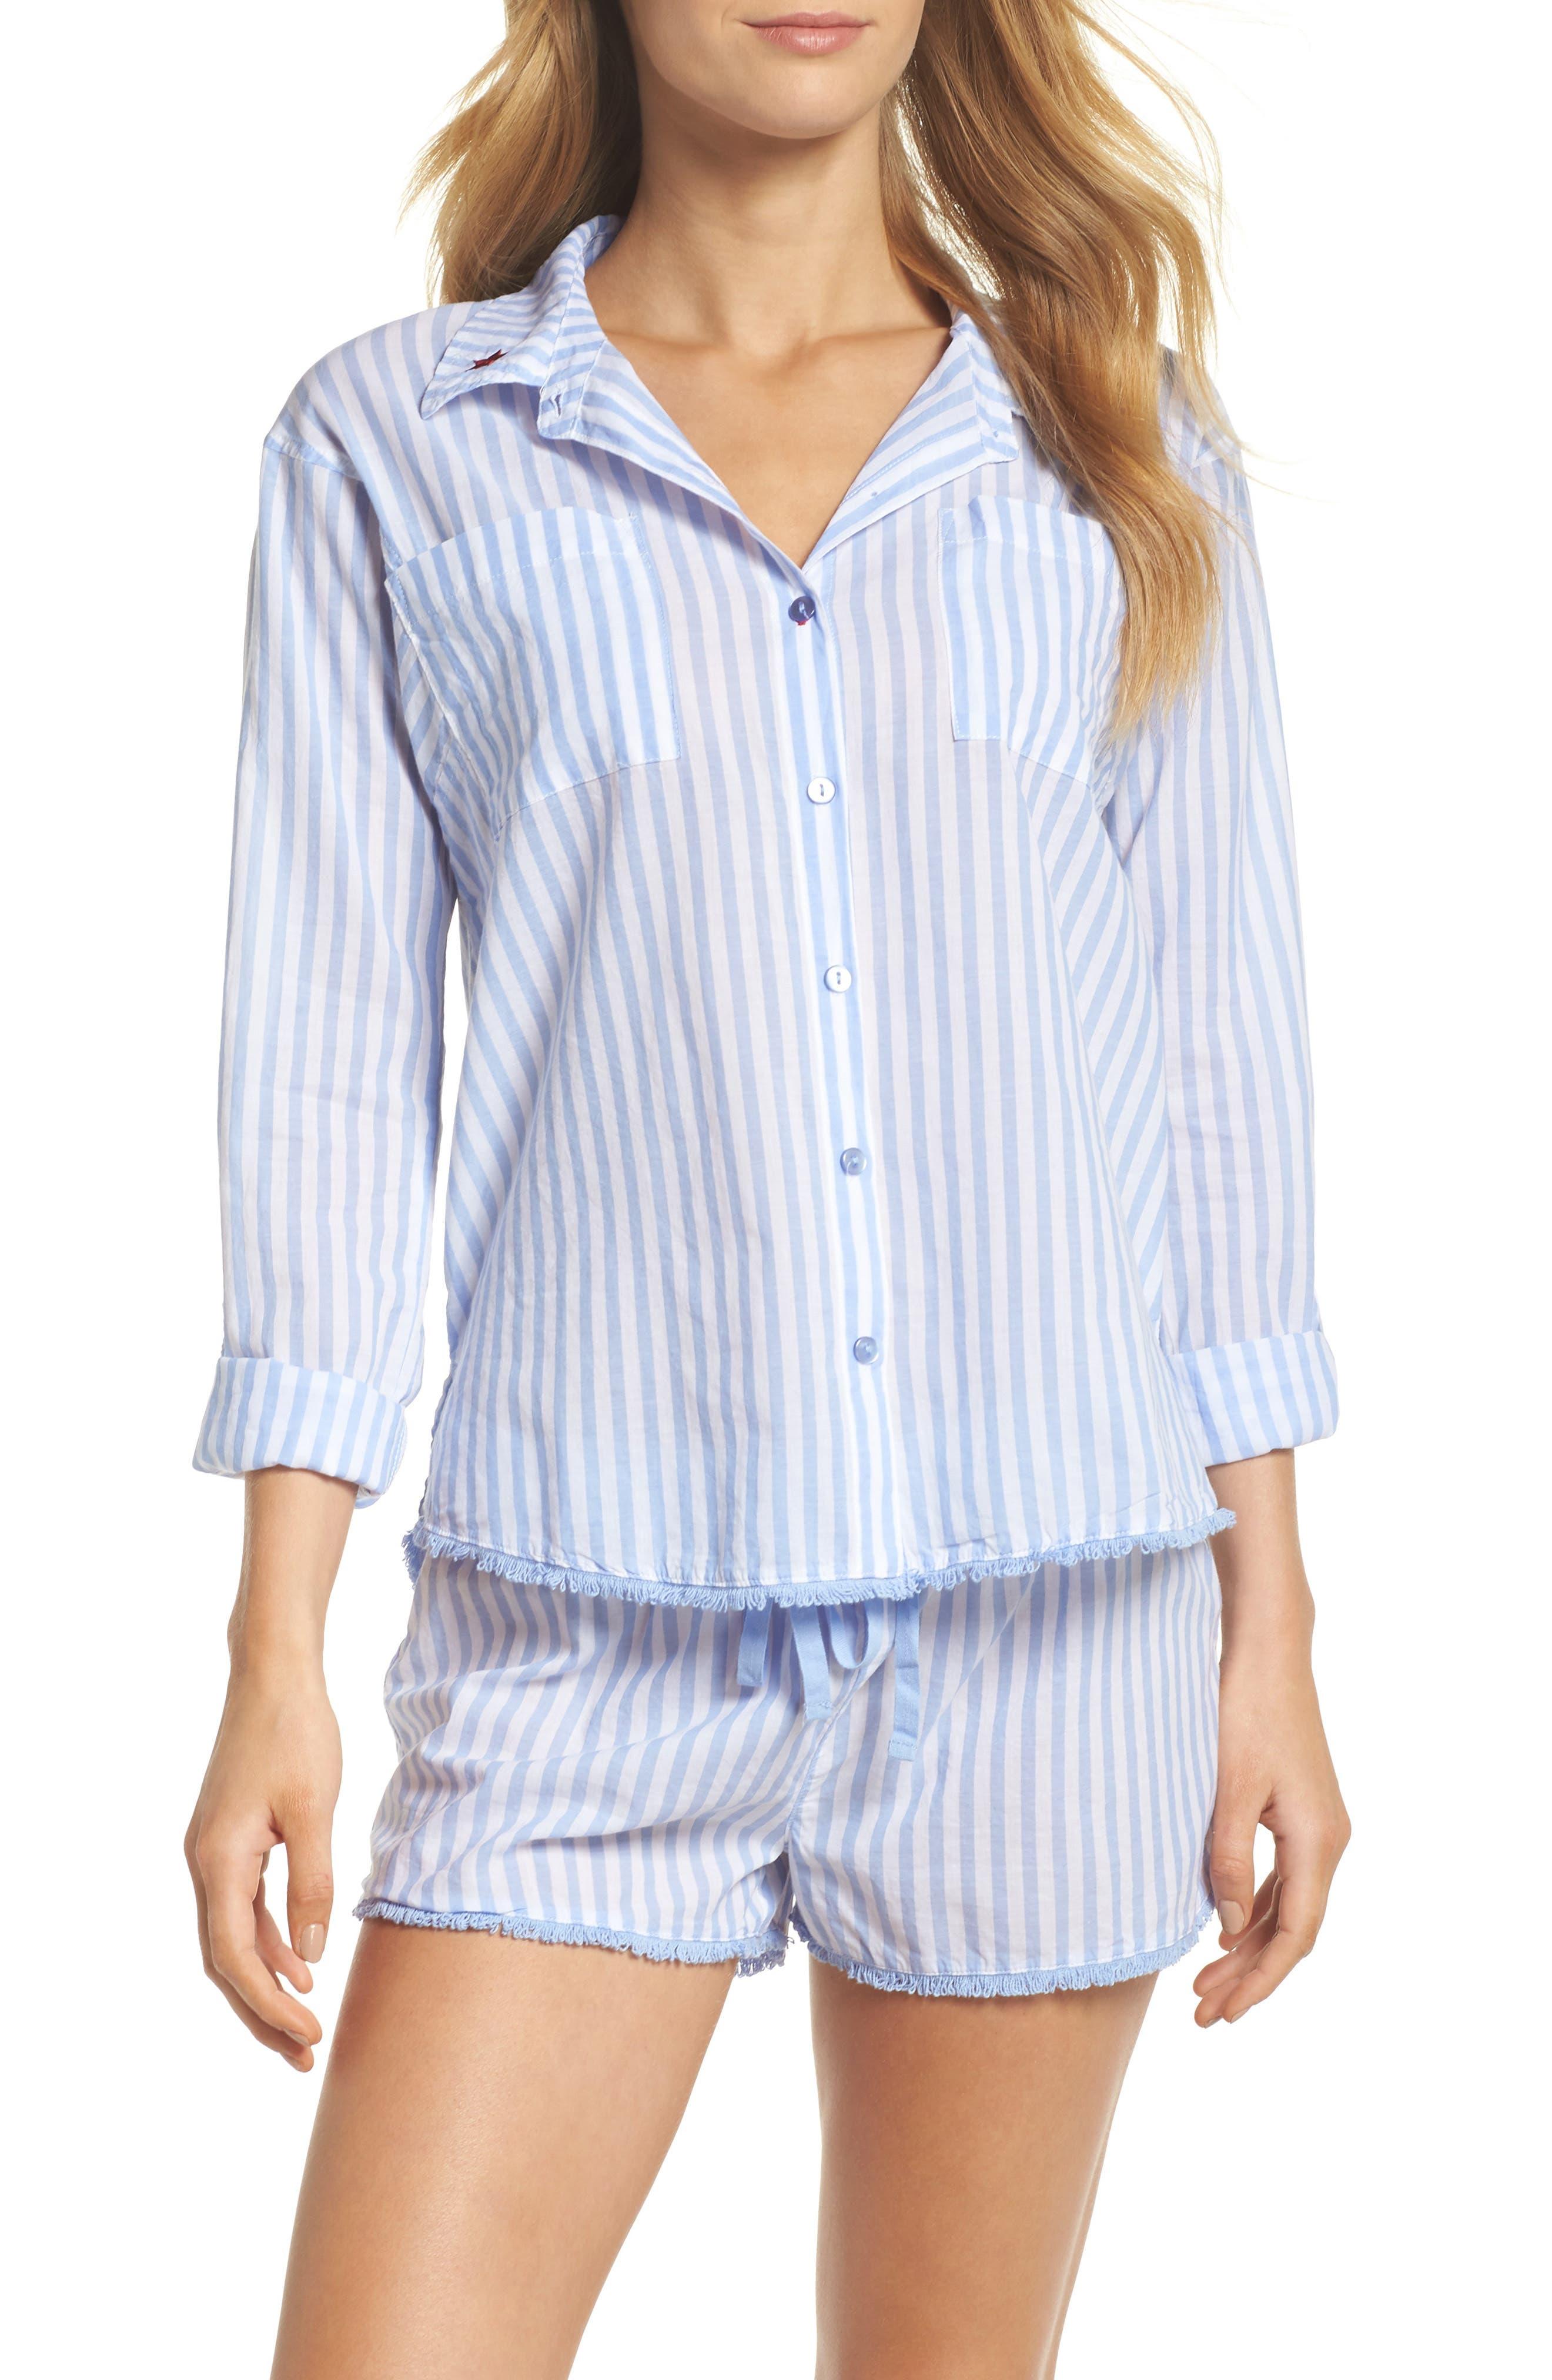 Stripe Short Pajamas,                             Main thumbnail 1, color,                             100